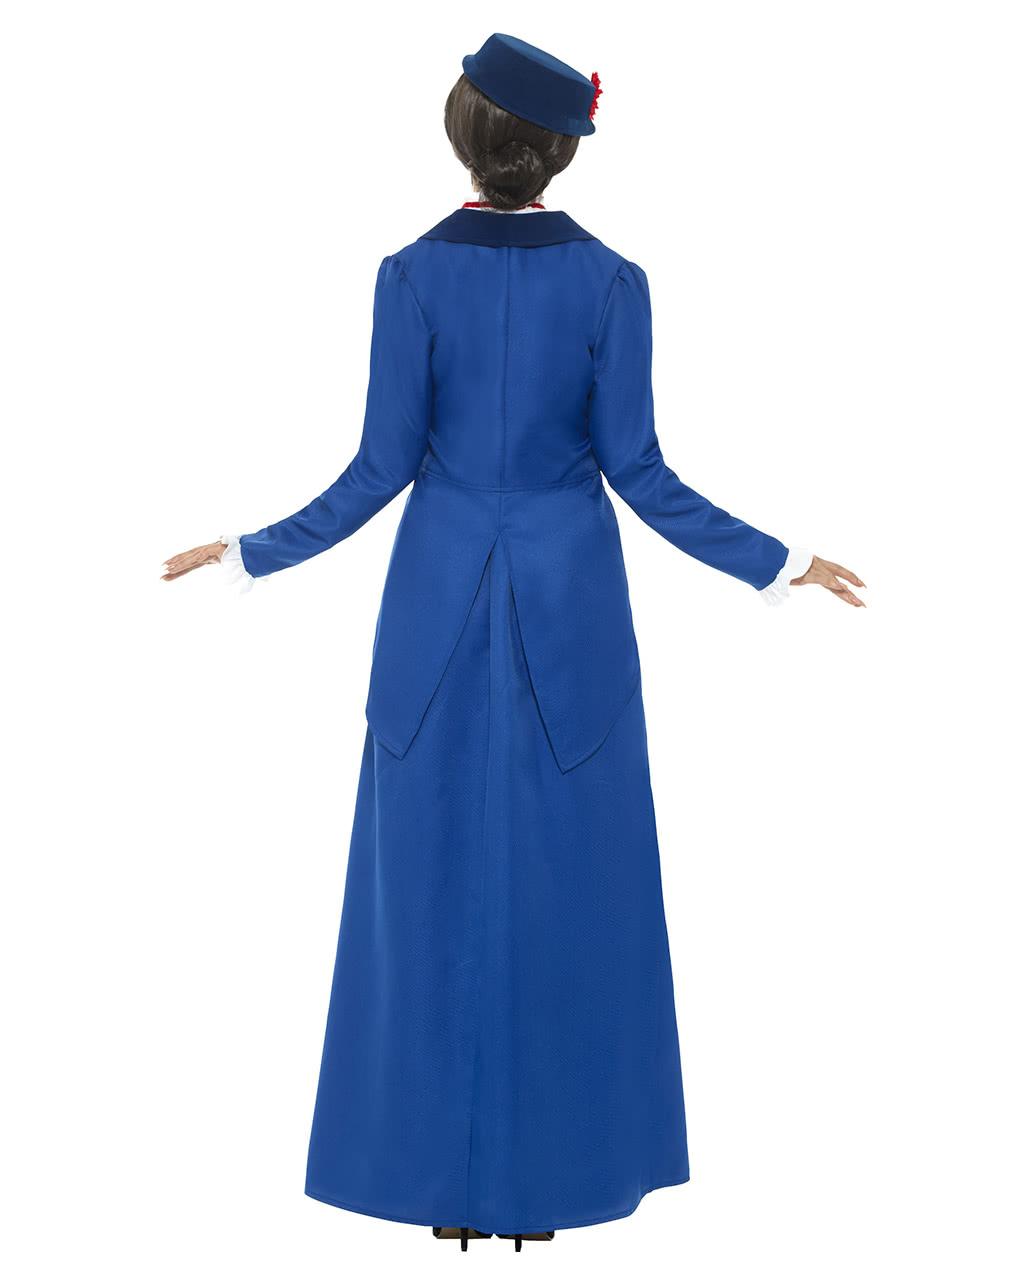 Viktorianische Nanny Kostüm Als Mary Poppins Horror Shopcom